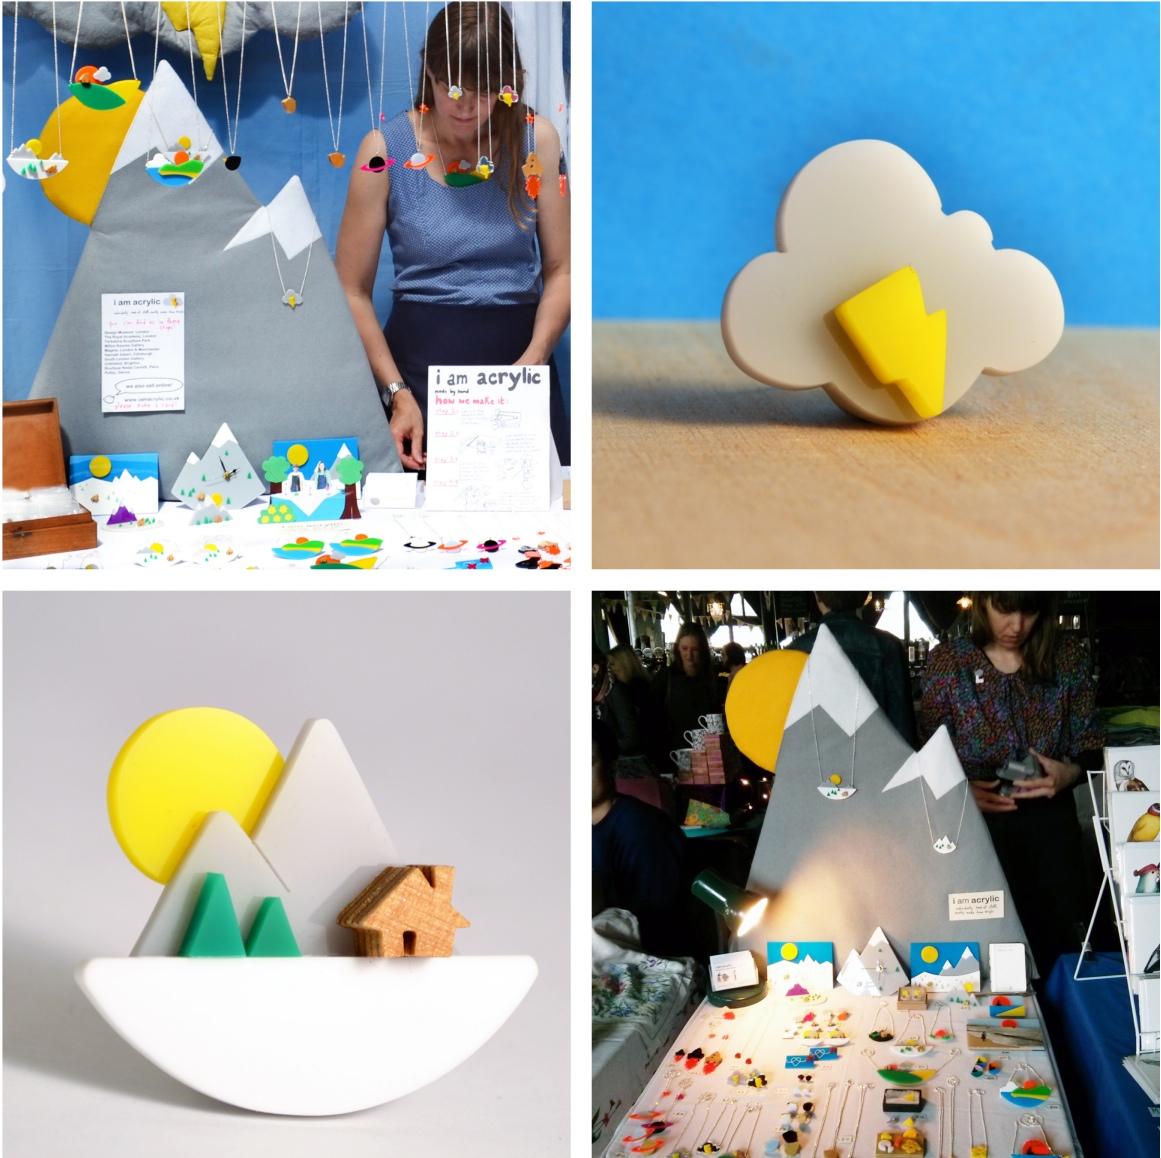 crafty fox stall proposal, stall design, I am acrylic, stall display, craft fair display advice, ideas, props